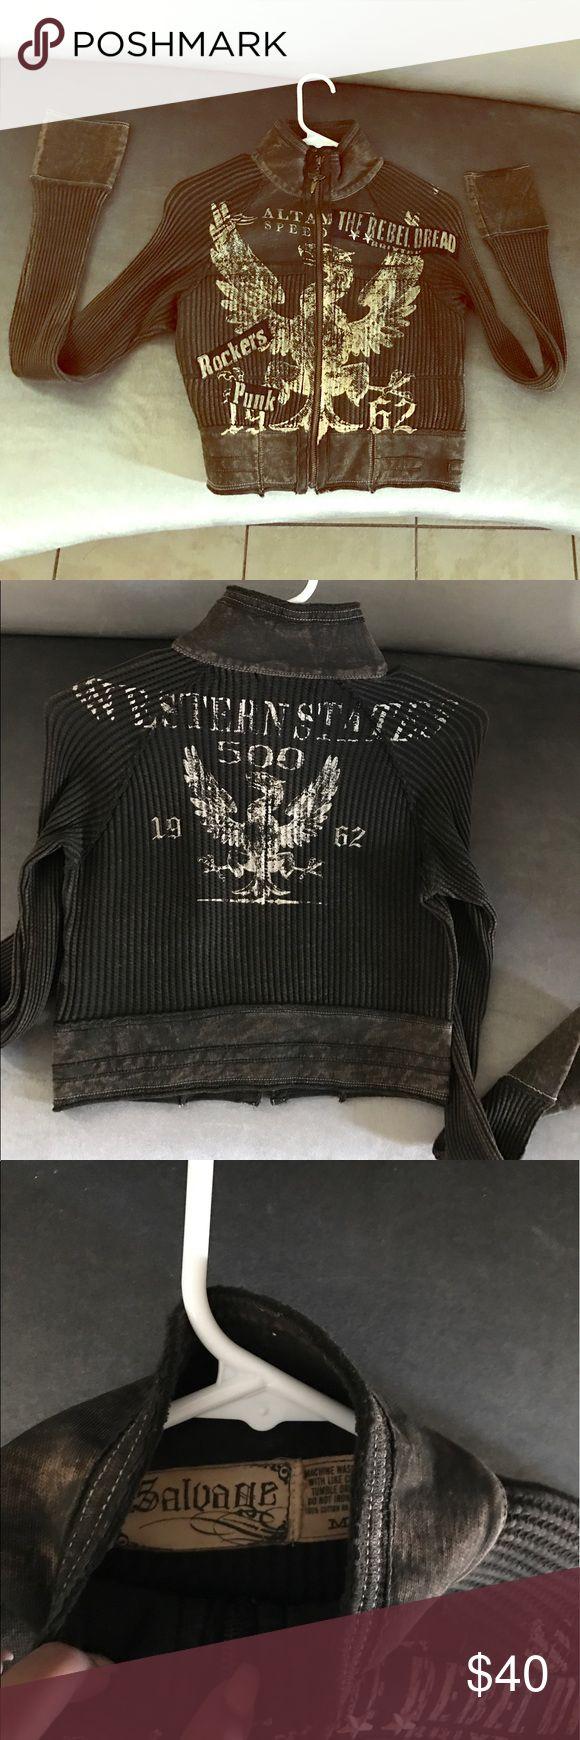 Salvage green zip up medium never used Salvage green zip up medium never used savage Sweaters Cardigans